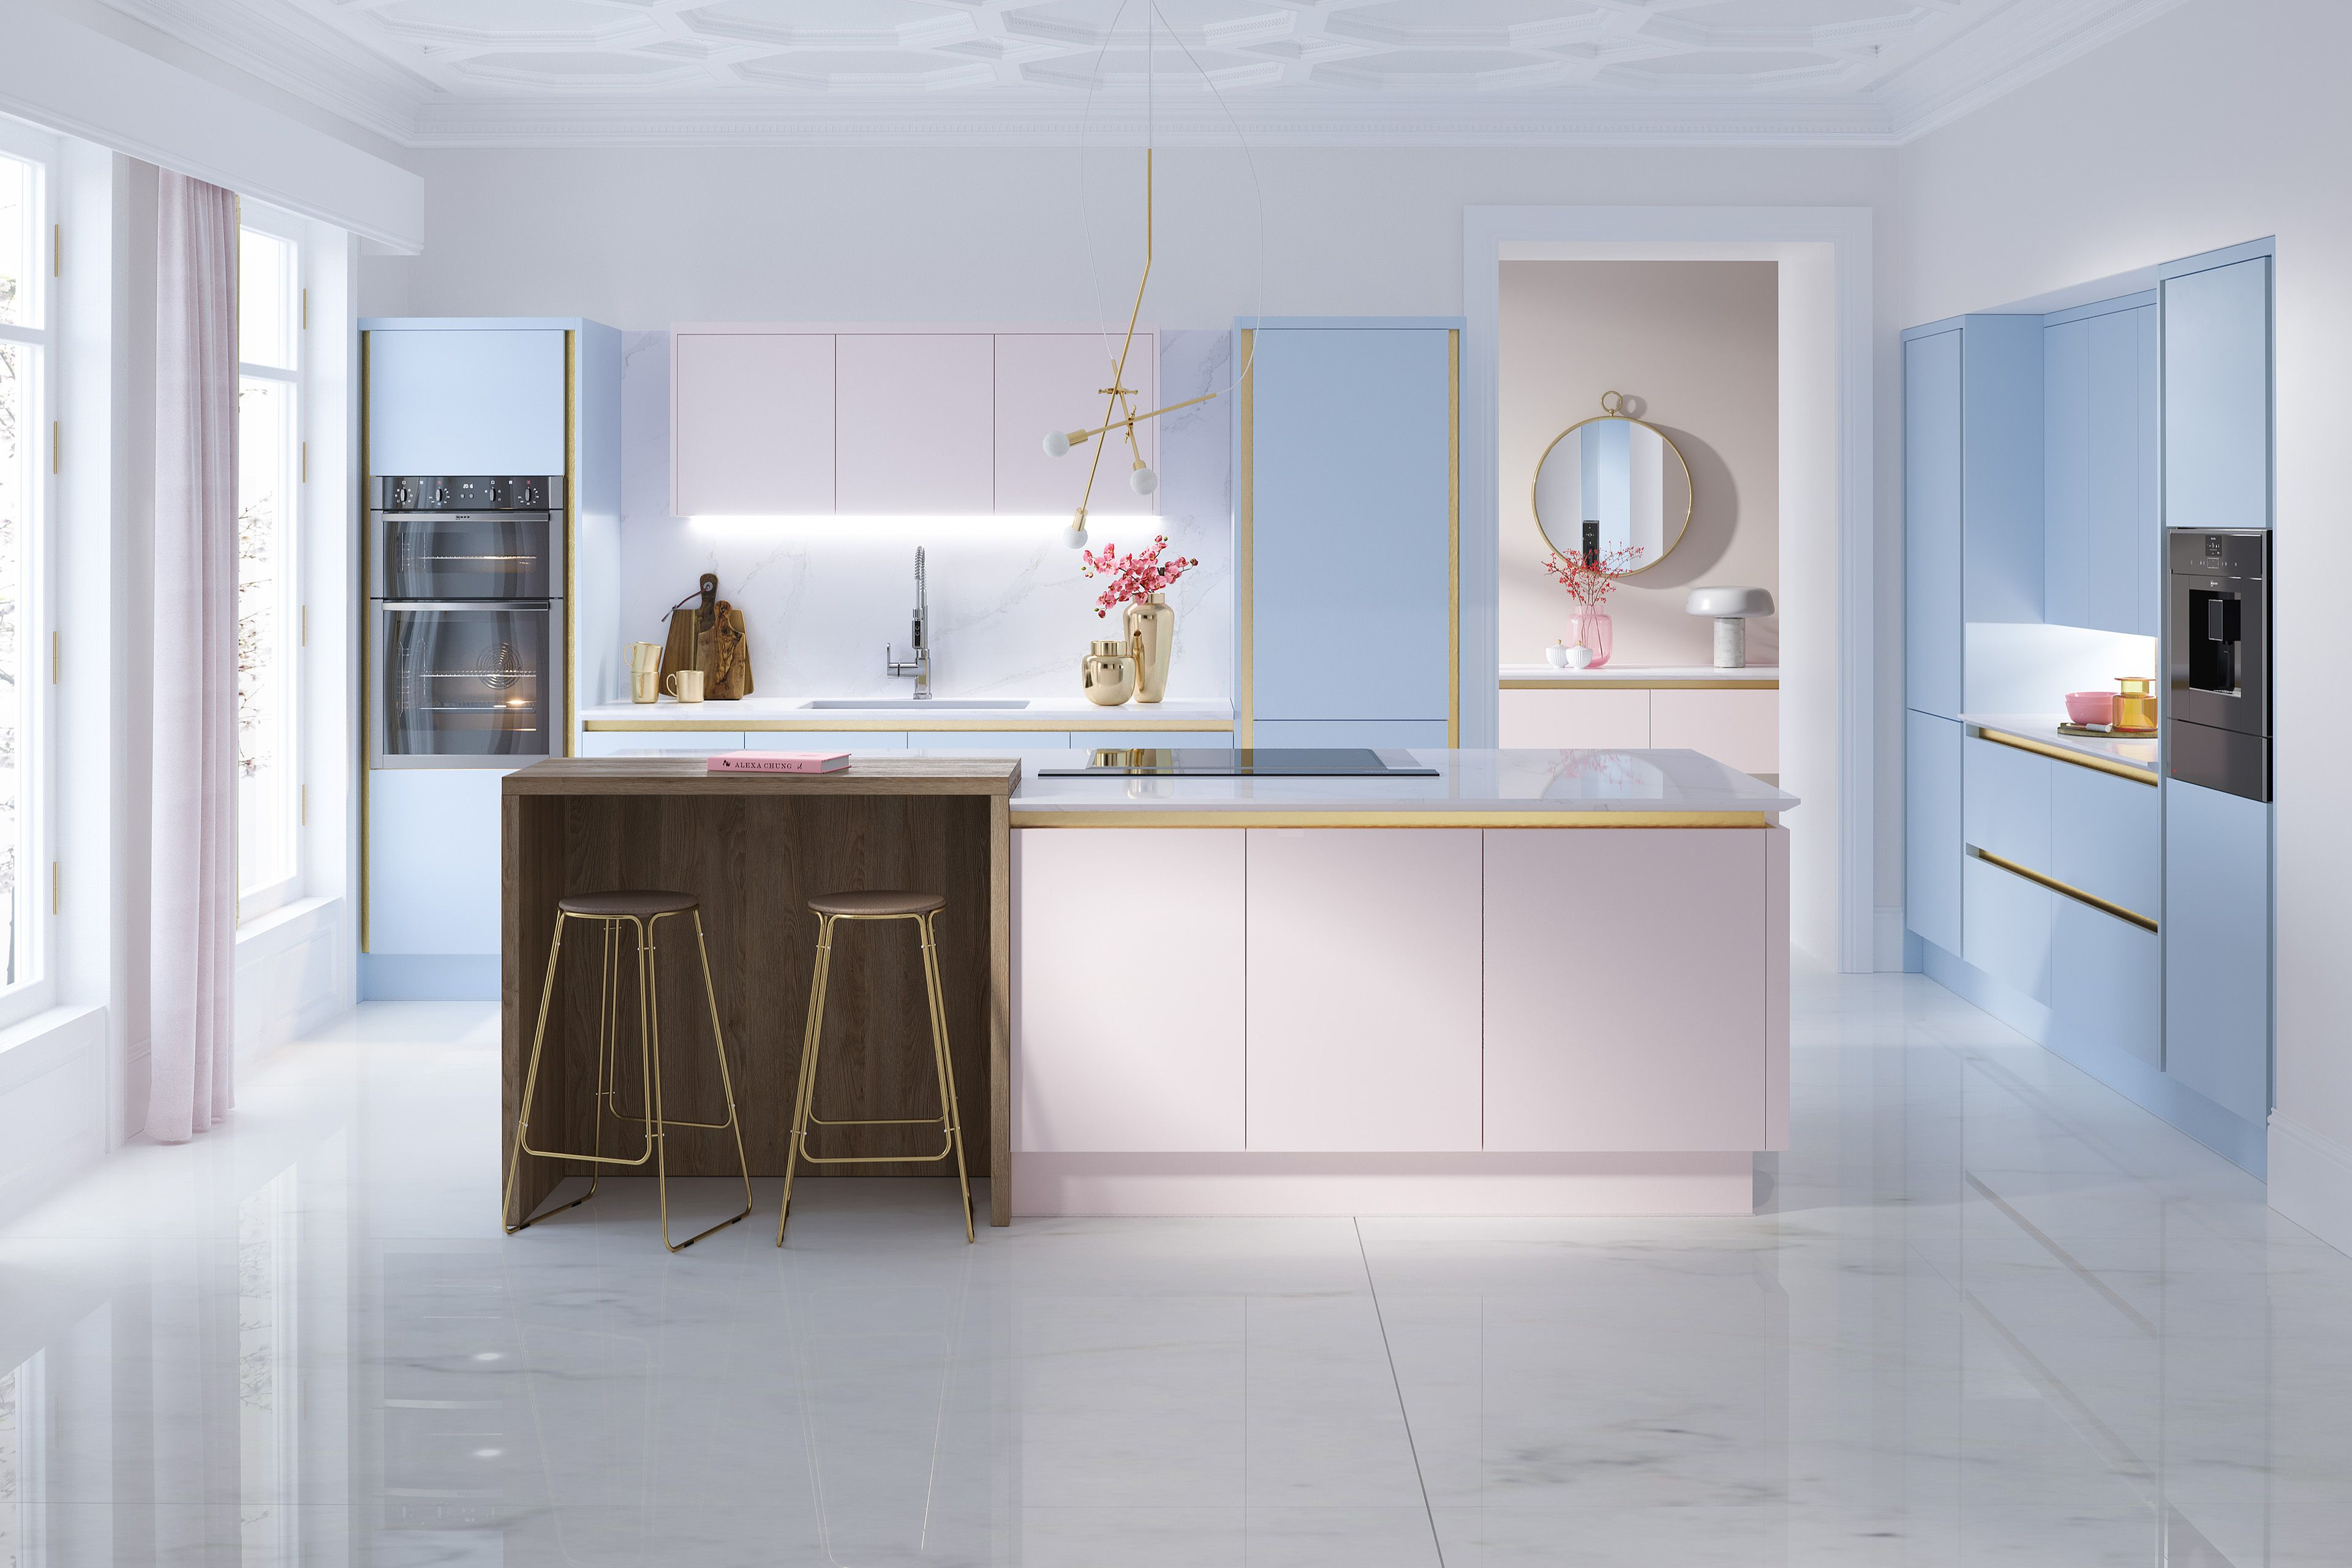 Macaroon CGI kitchens on Behance | Wren kitchen, Pastel ...